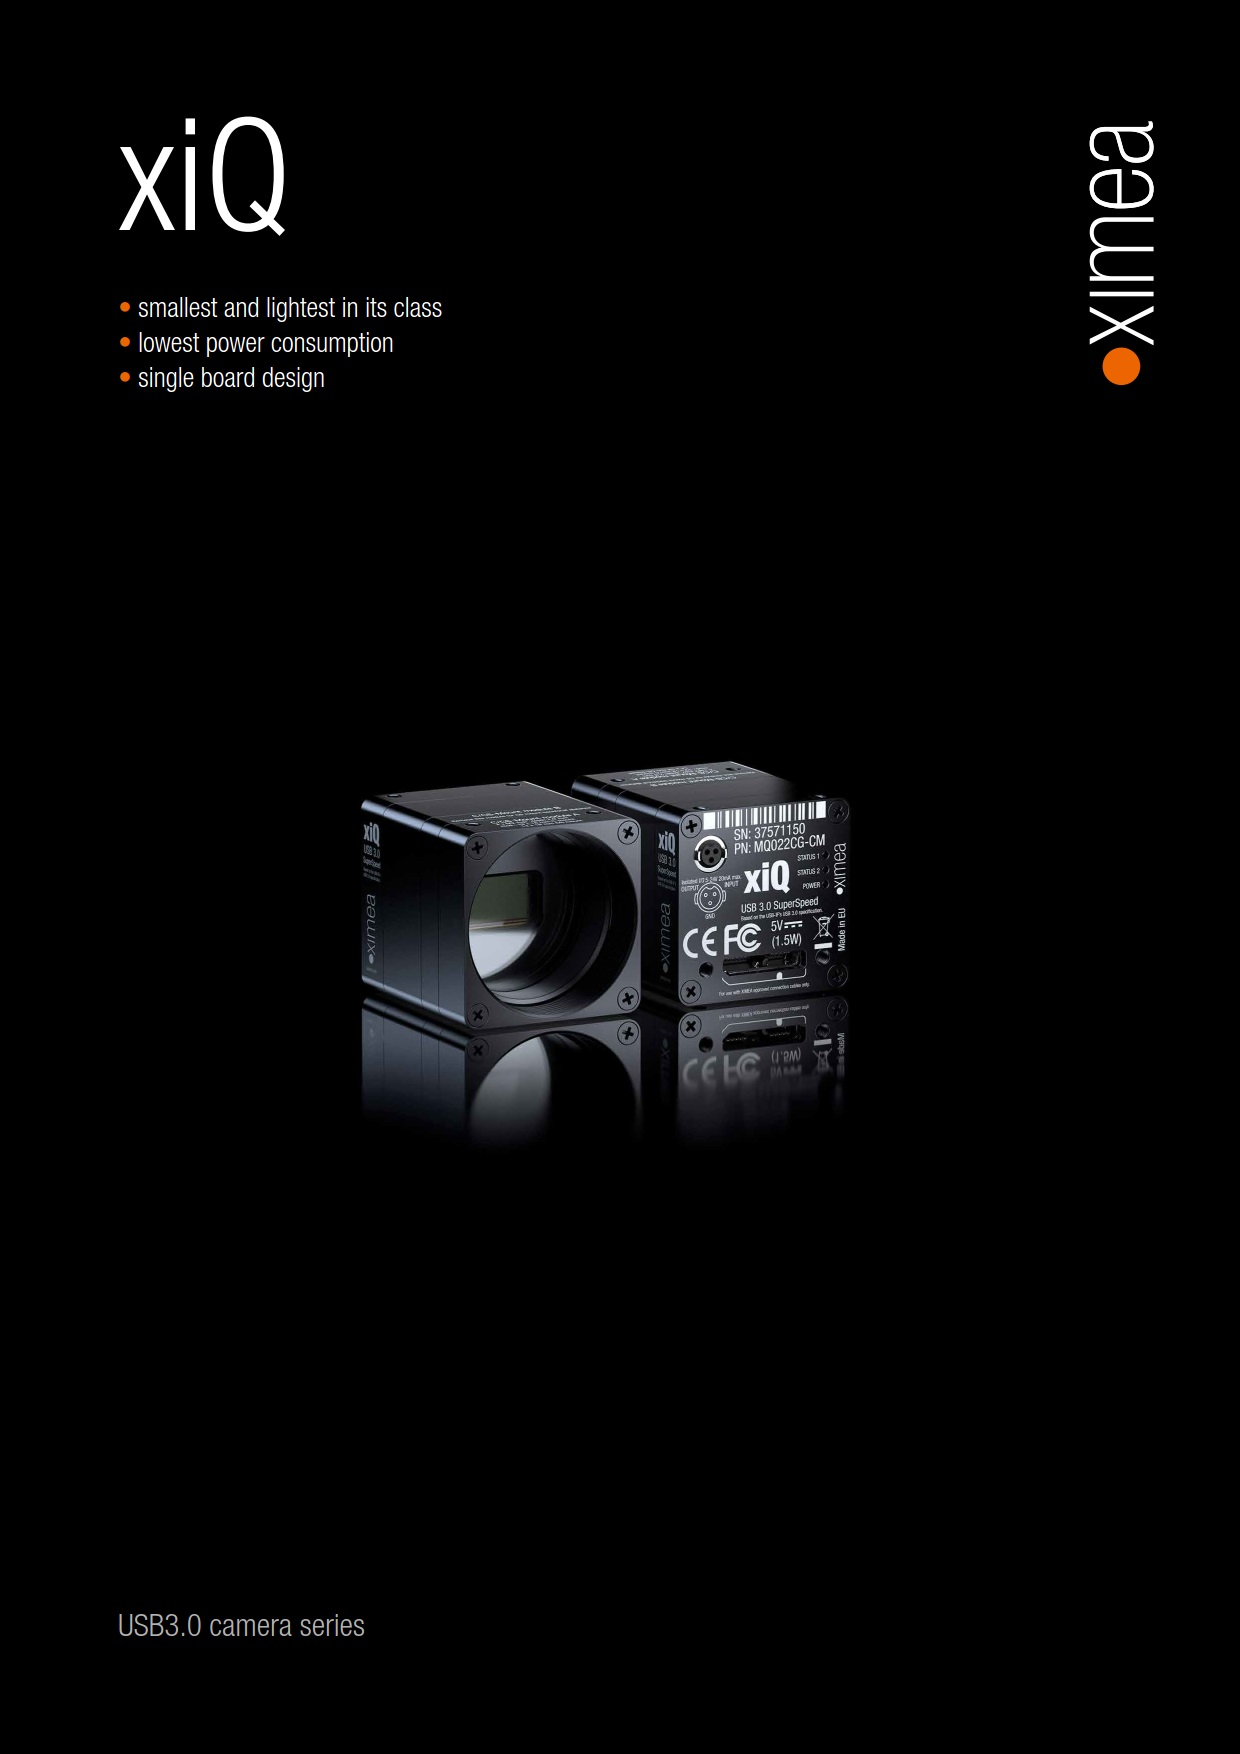 XIMEA - USB 3 0 Camera with CMOS